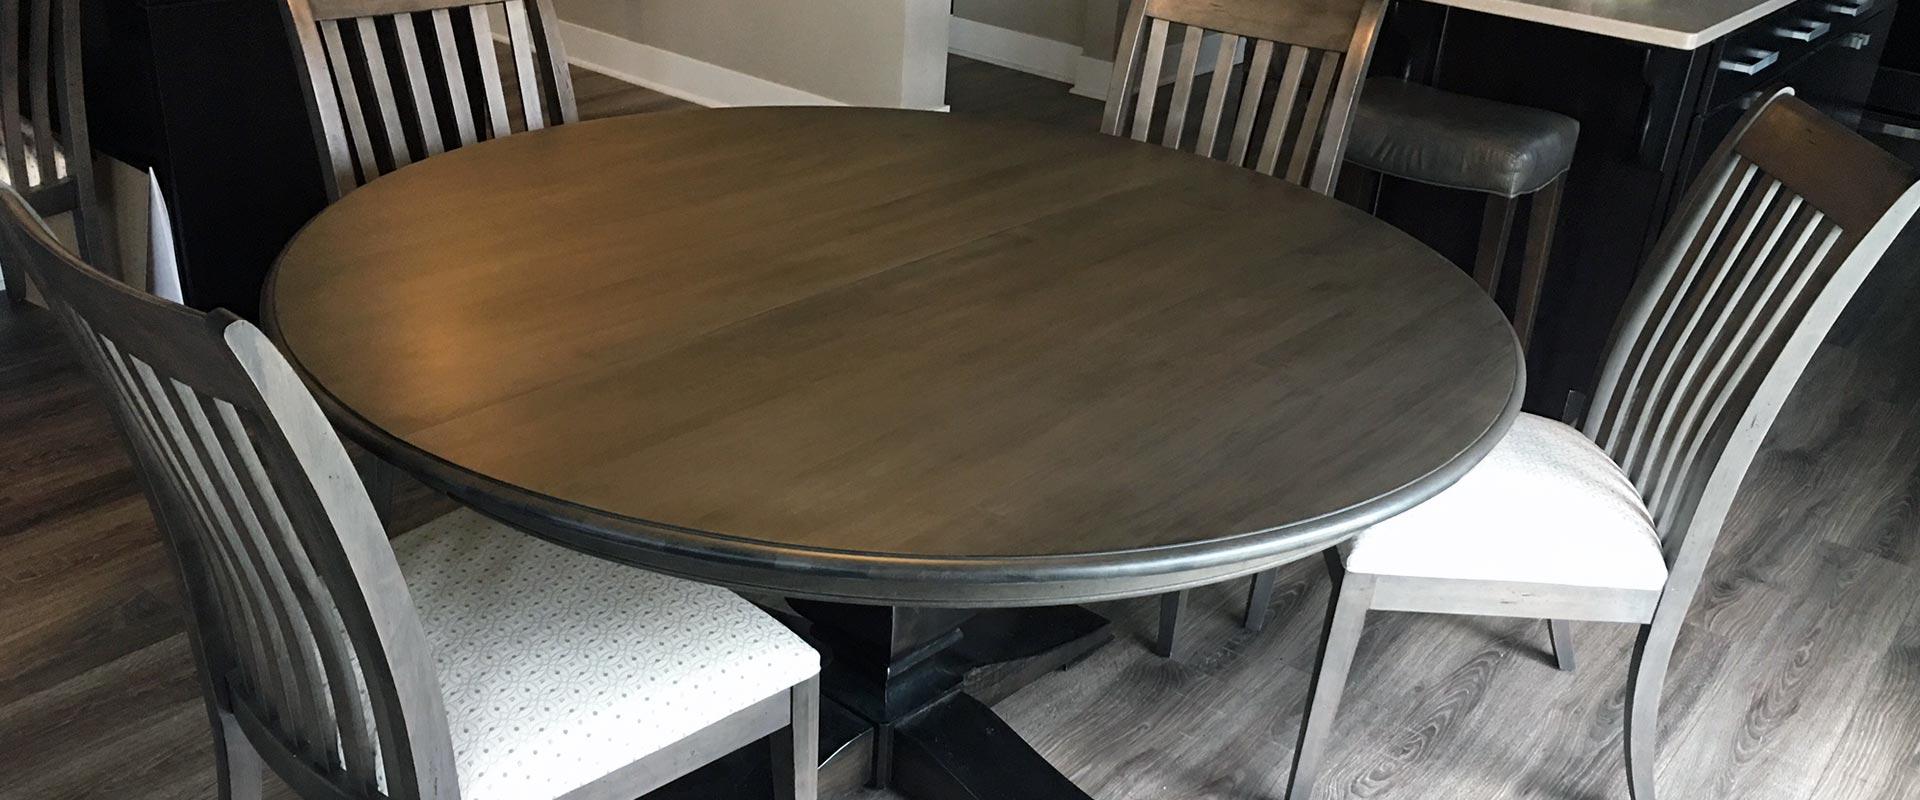 PFR-progressive-furniture-refinishing-grand-rapids-mi_slide1